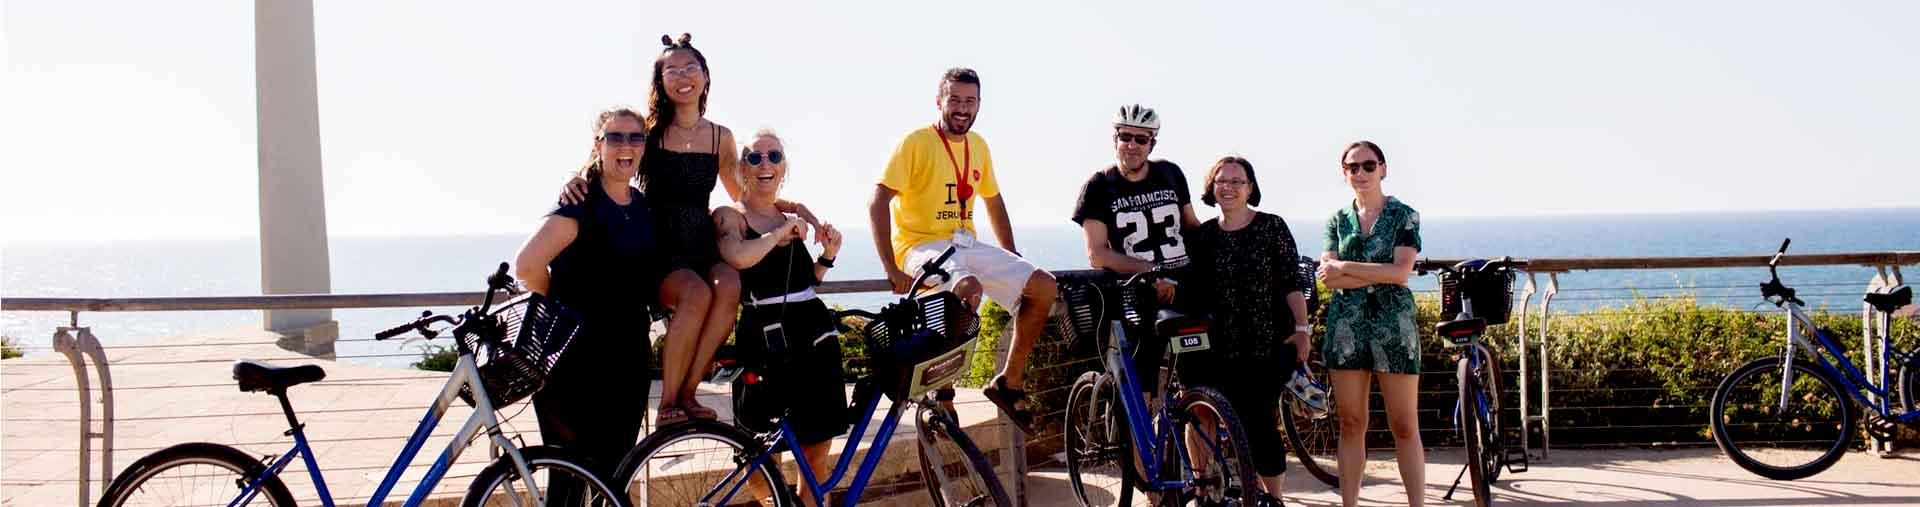 bike tour through the real Tel Aviv